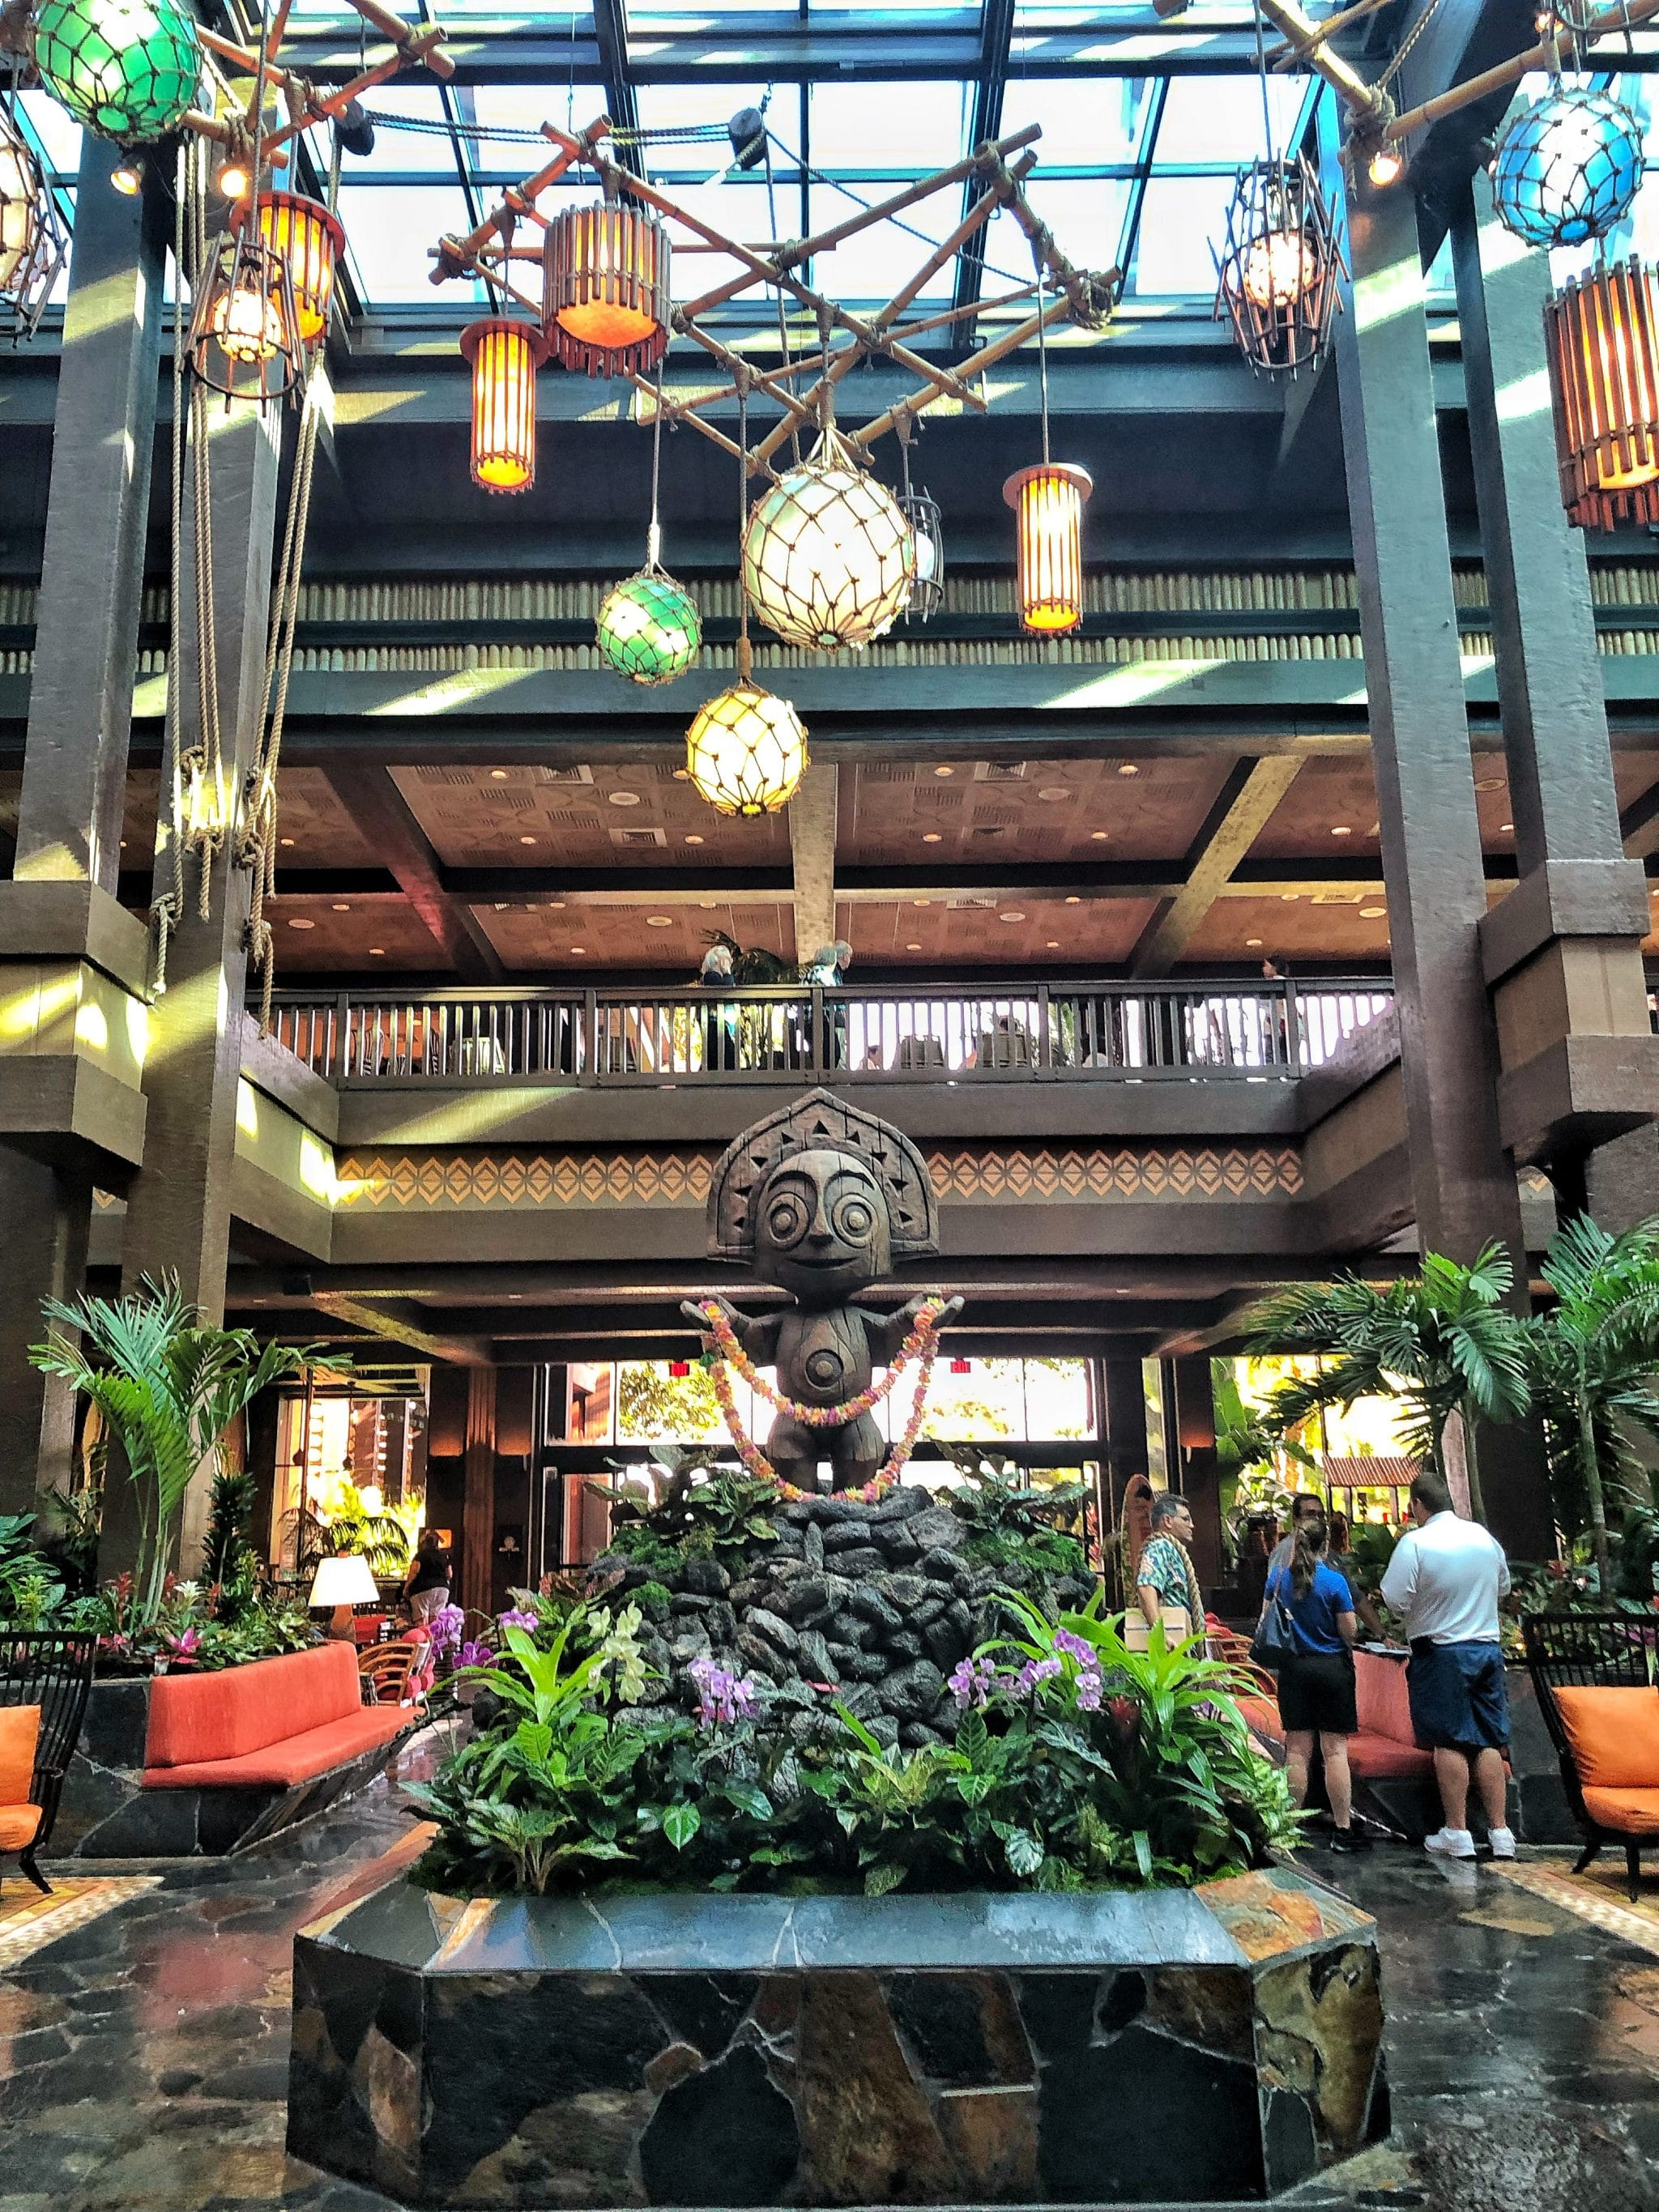 Vegan Breakfast Review at Kona Cafe in Disney's Polynesian Village Resort at Walt Disney World